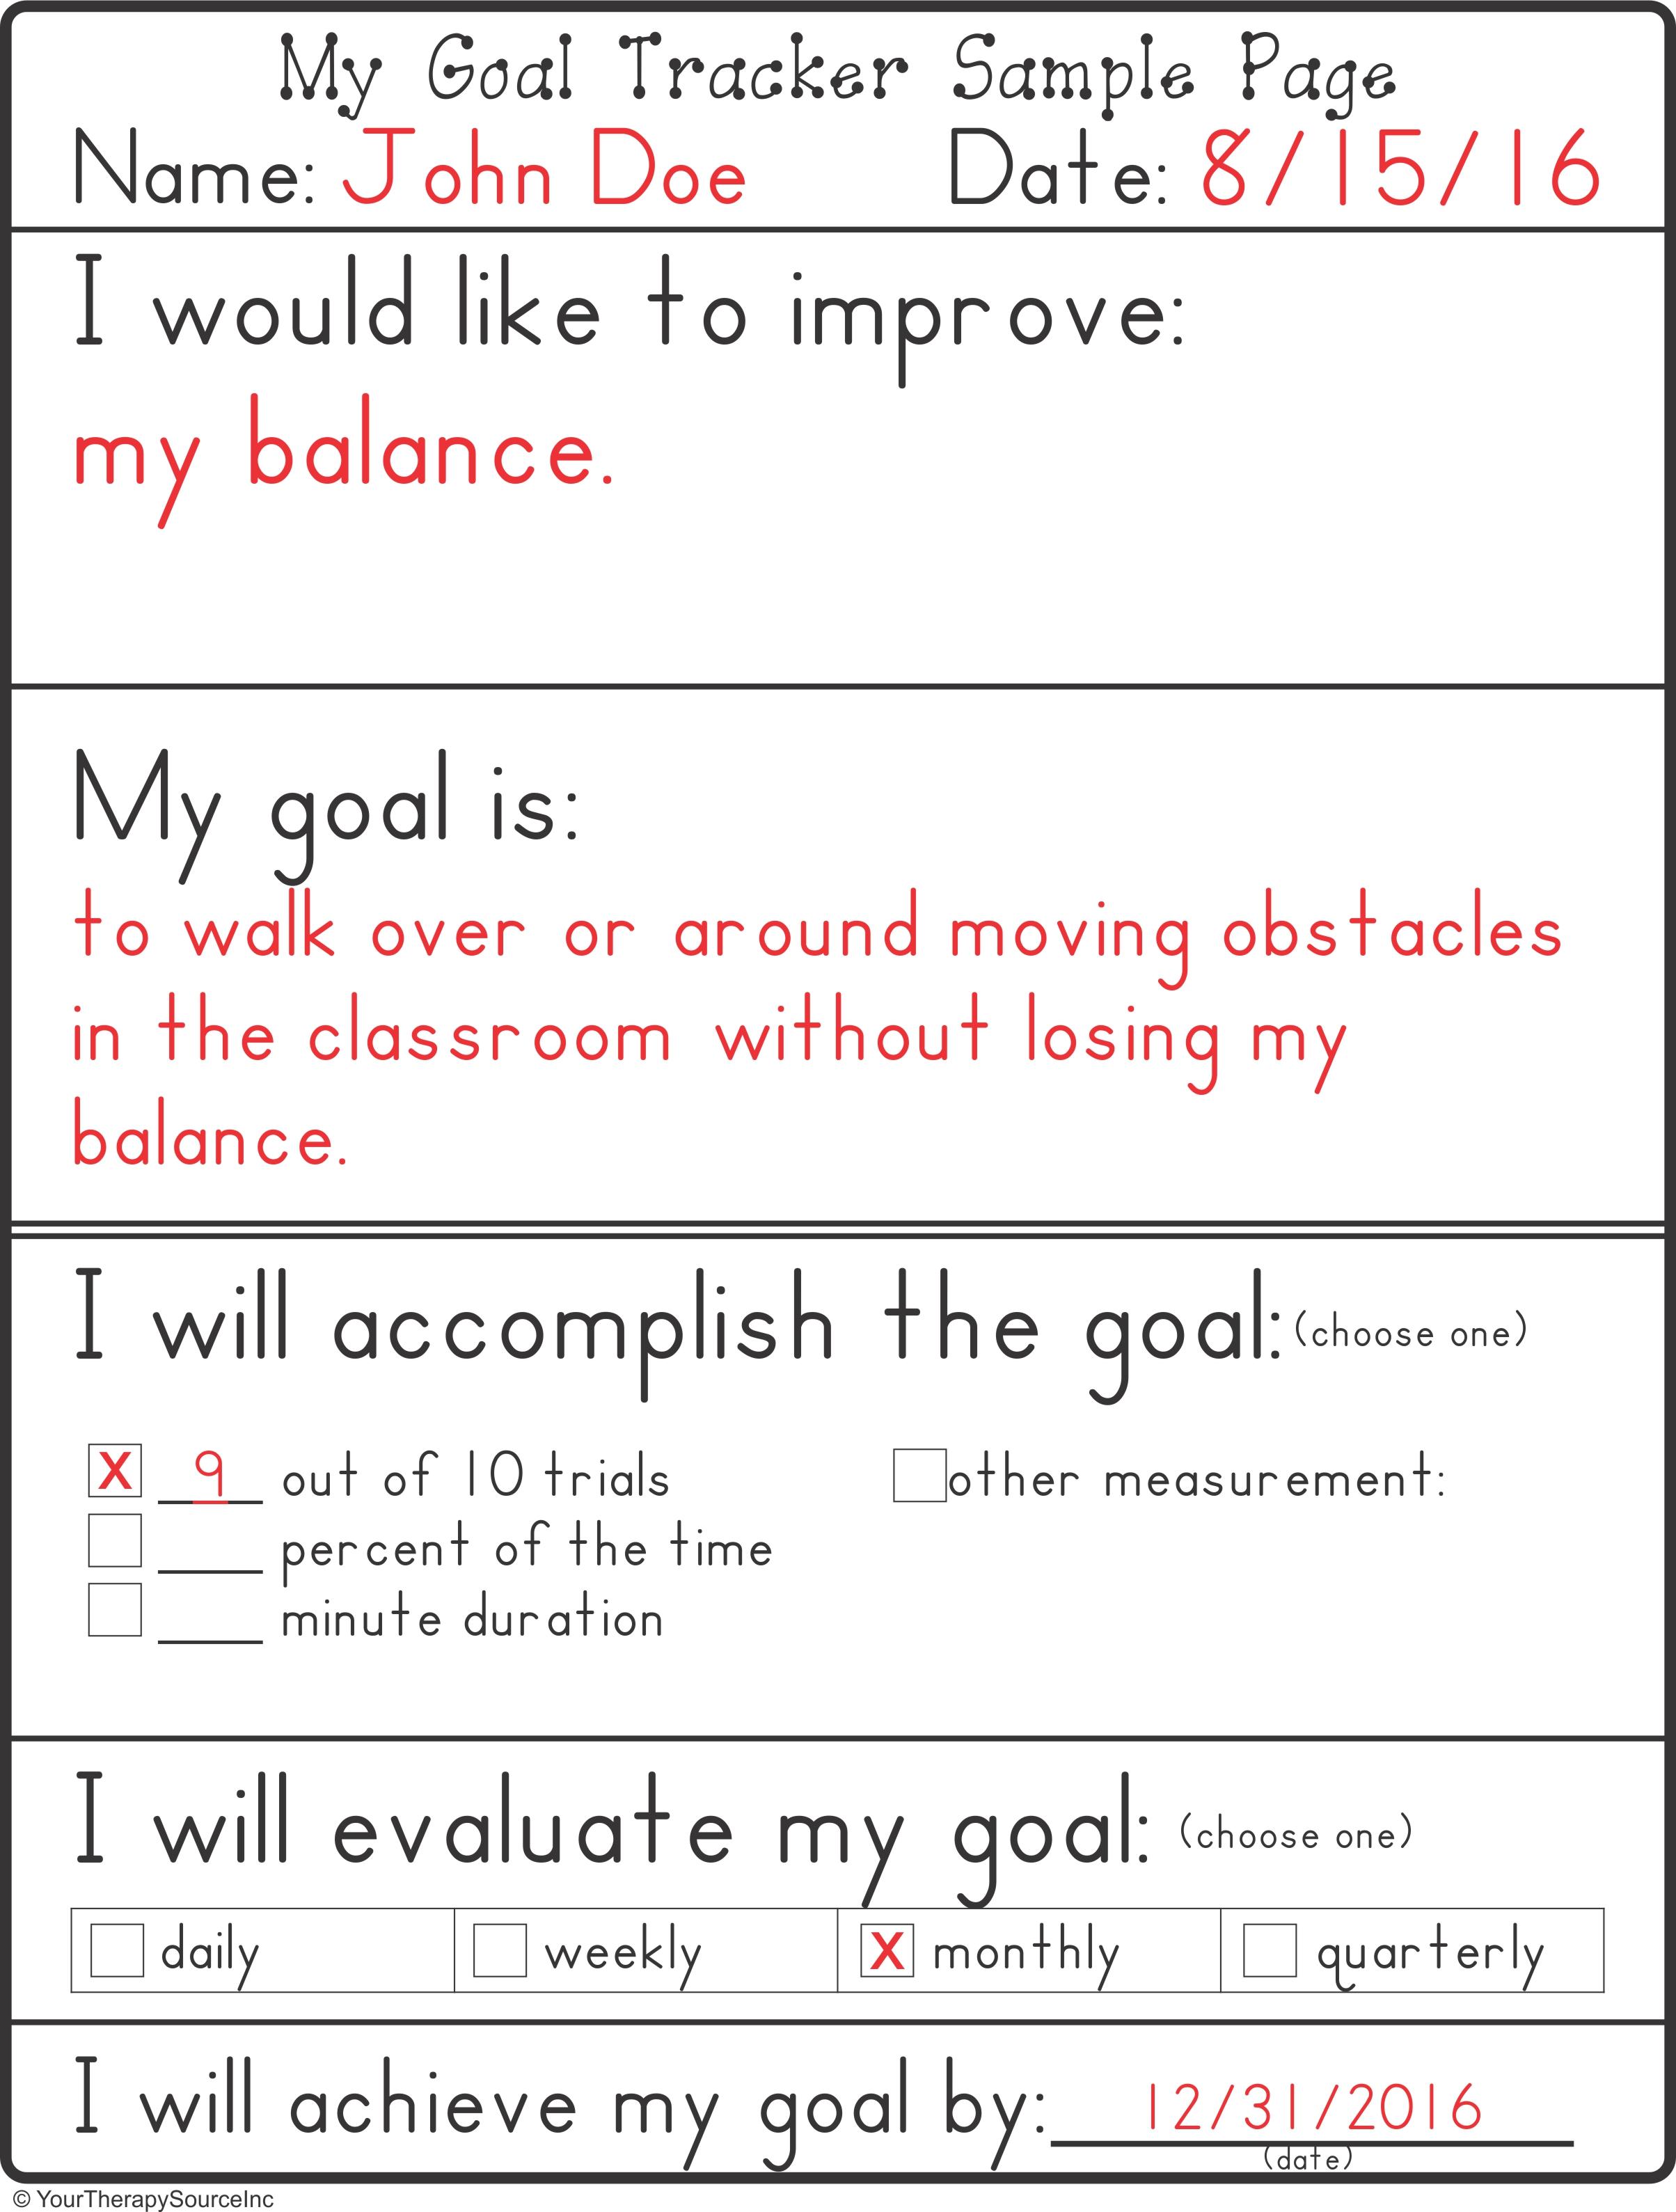 3 Strategies To Help Children Initiate And Plan Motor Skills